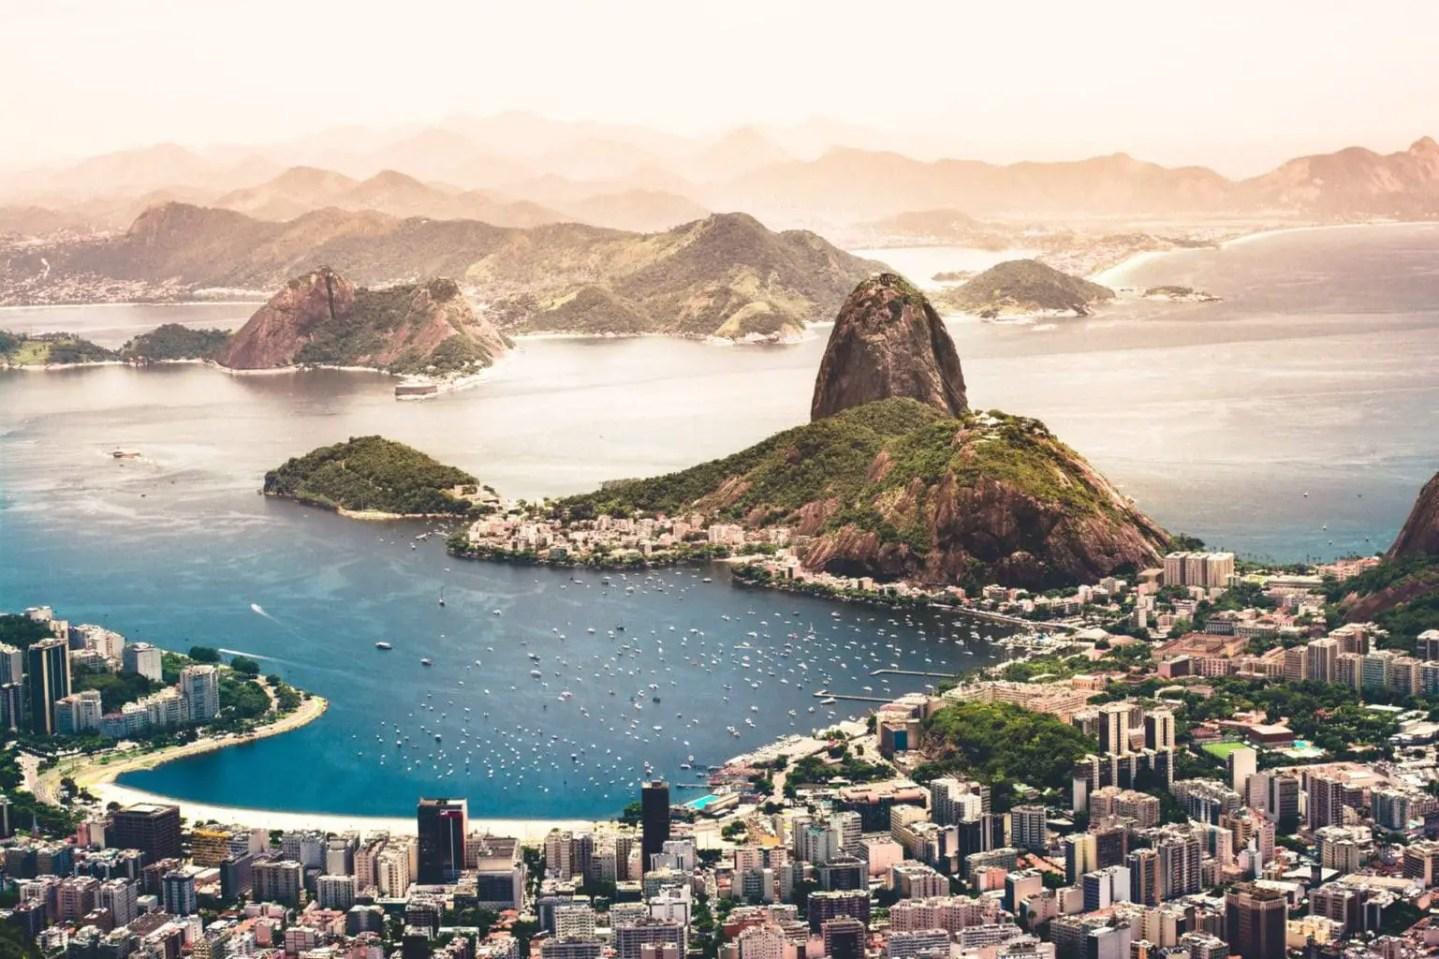 Picture of the bay of Rio de Janeiro, Brazil